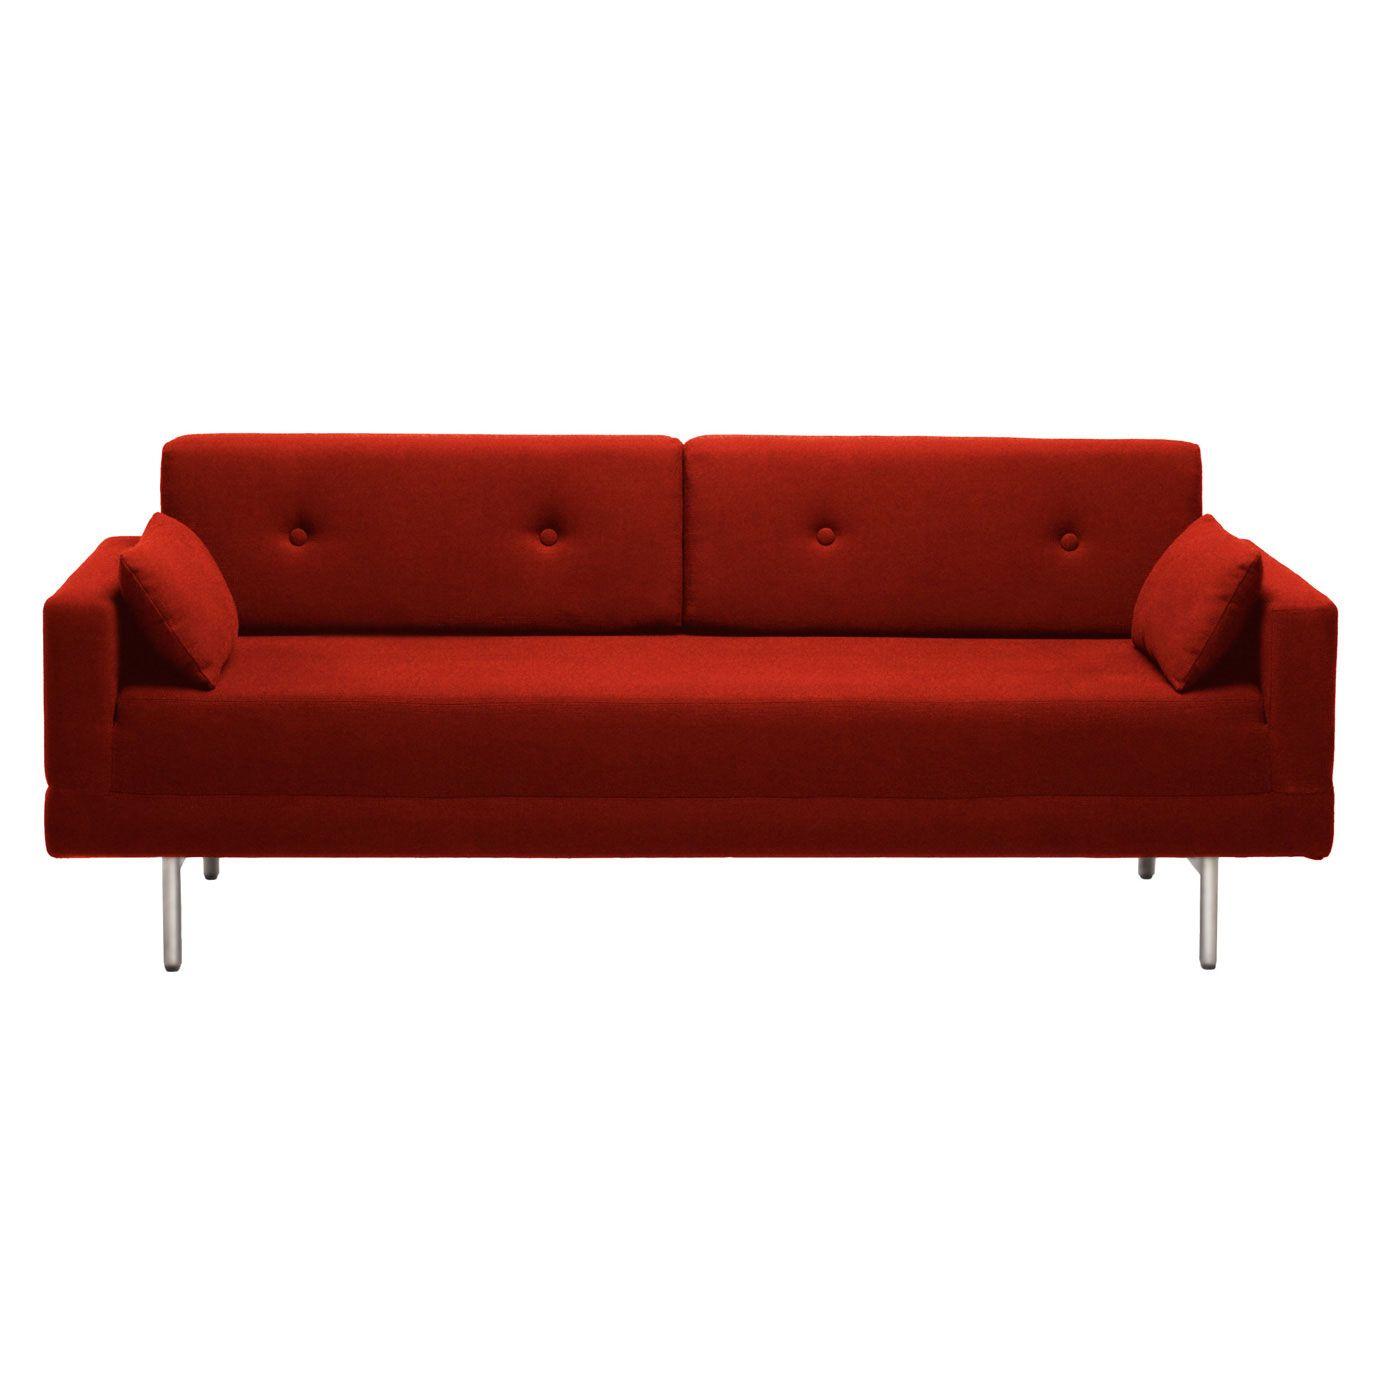 sofasandmore cheap designer sofas bludot one night stand sleeper sofa 1799 the seat